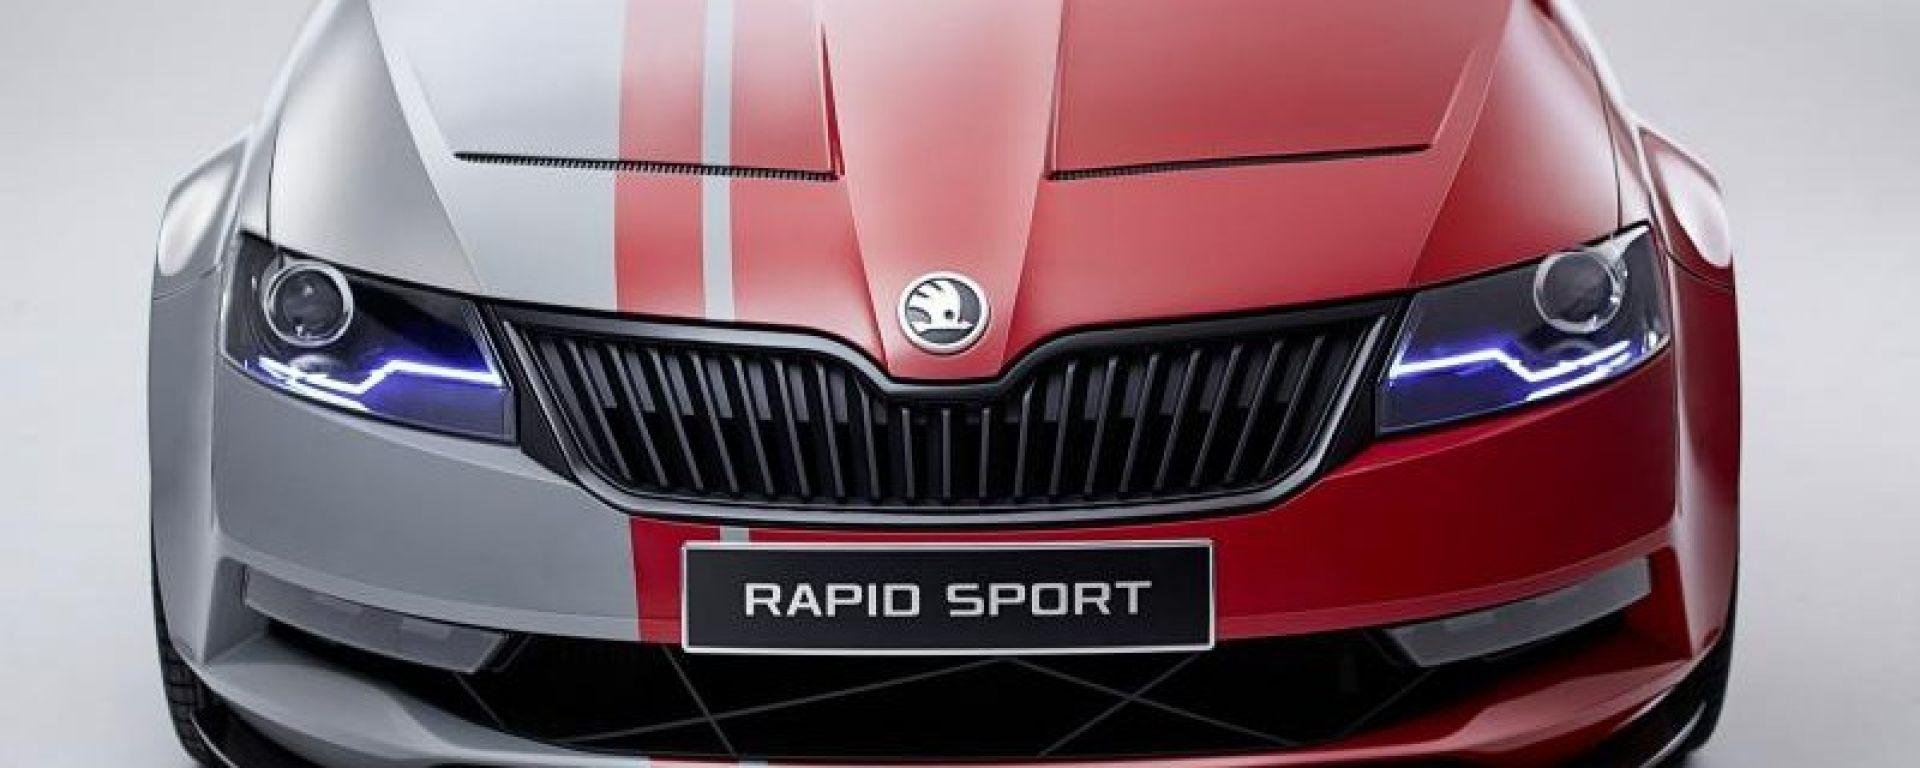 Skoda Rapid Sport: le nuove foto